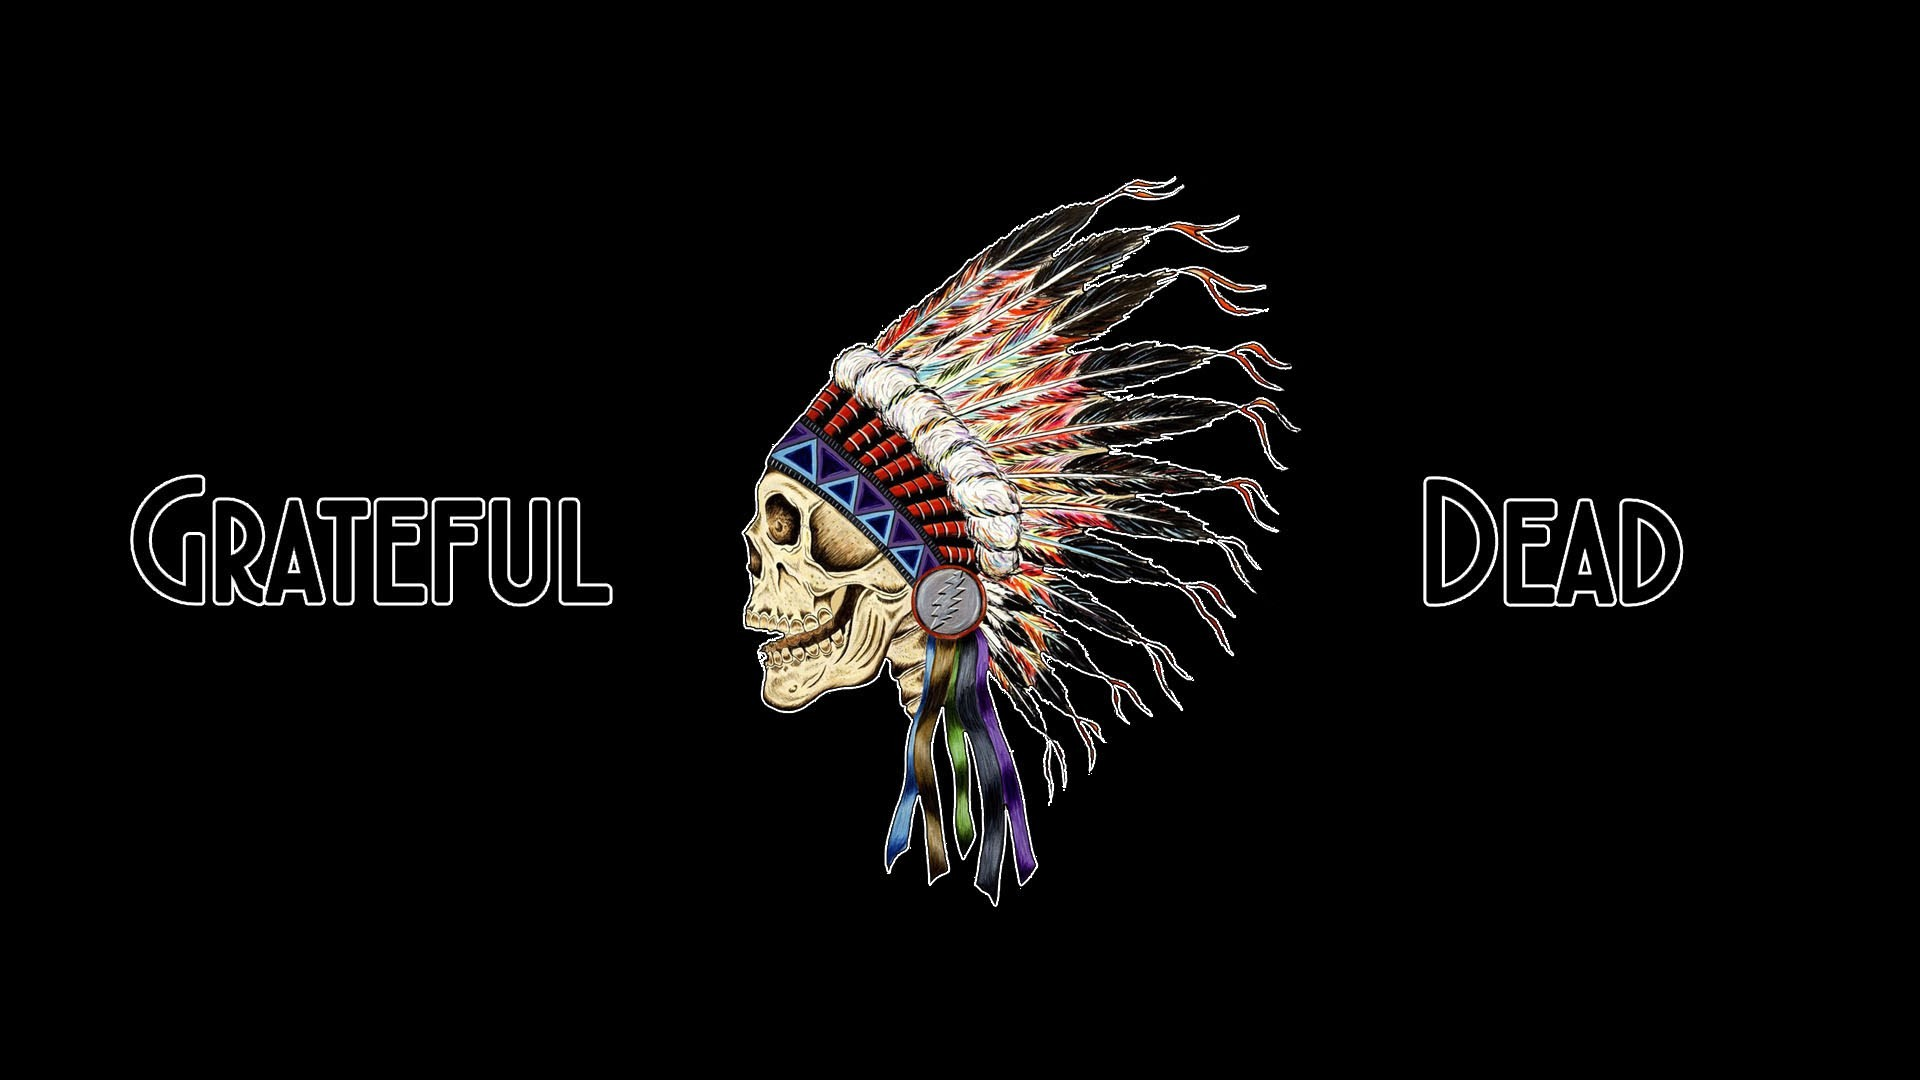 wallpaper for desktop grateful dead